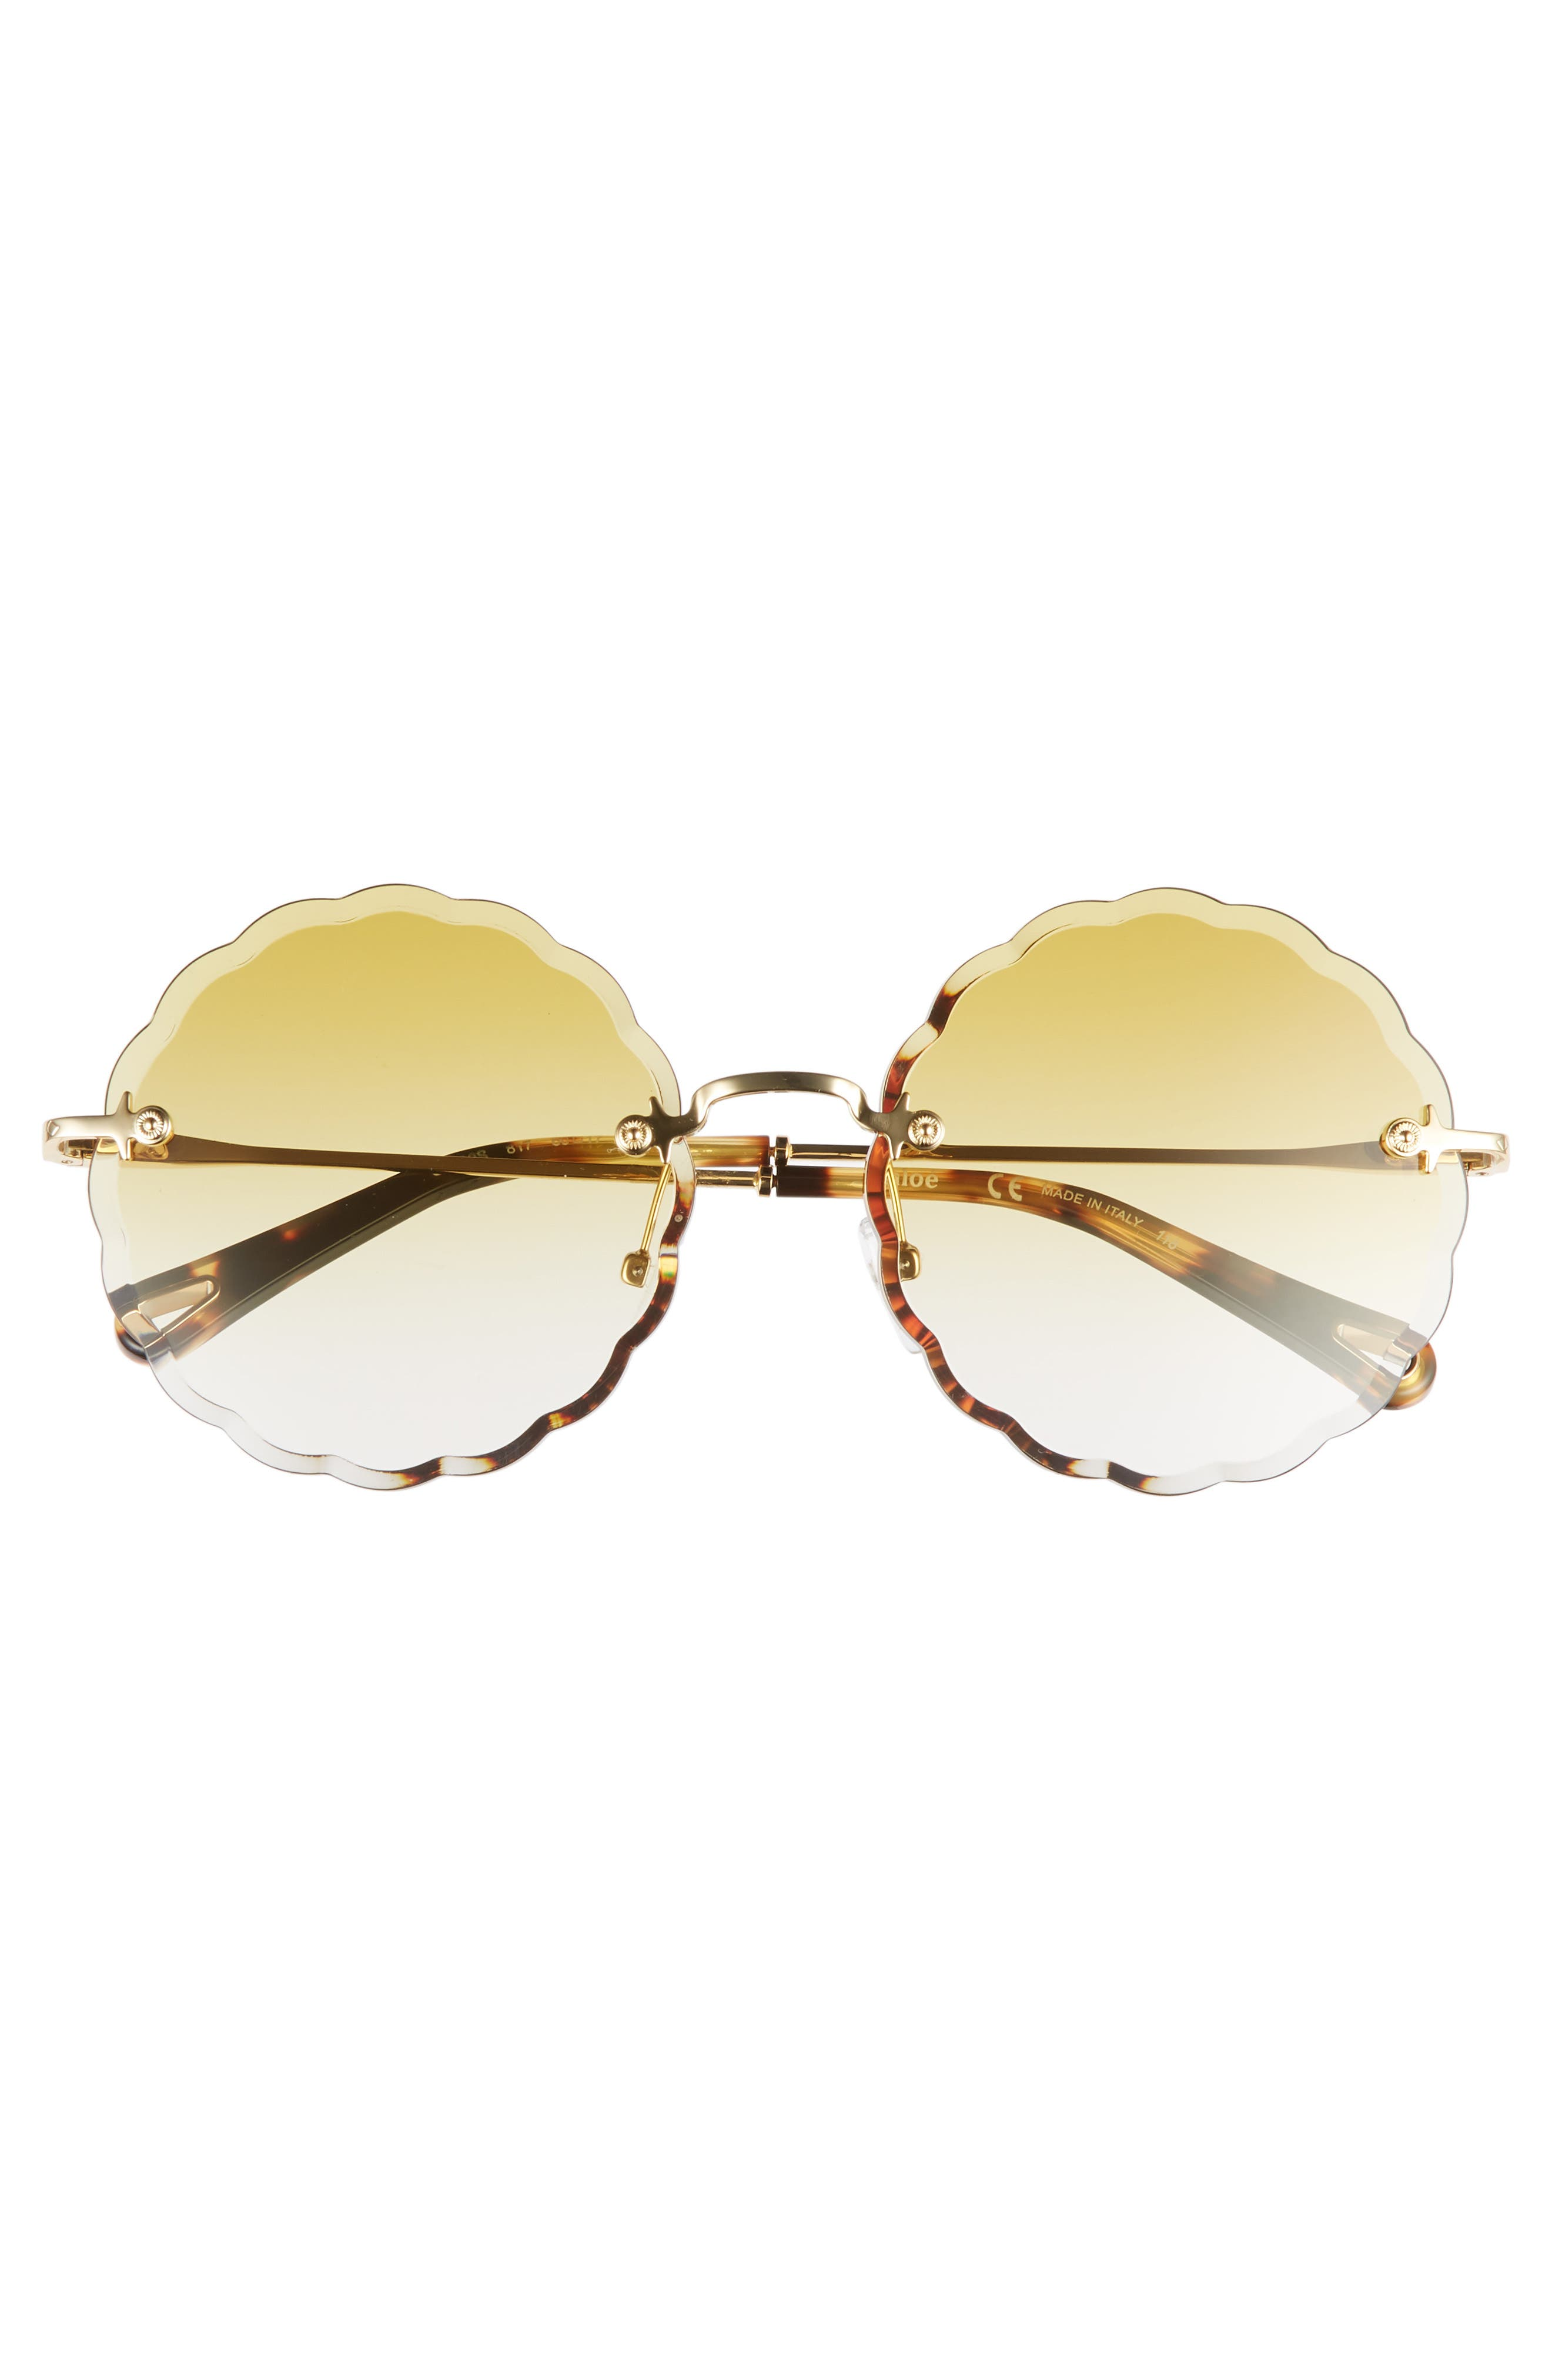 Rosie 60mm Scalloped Rimless Sunglasses,                             Alternate thumbnail 3, color,                             Gold/ Gradient Ochre